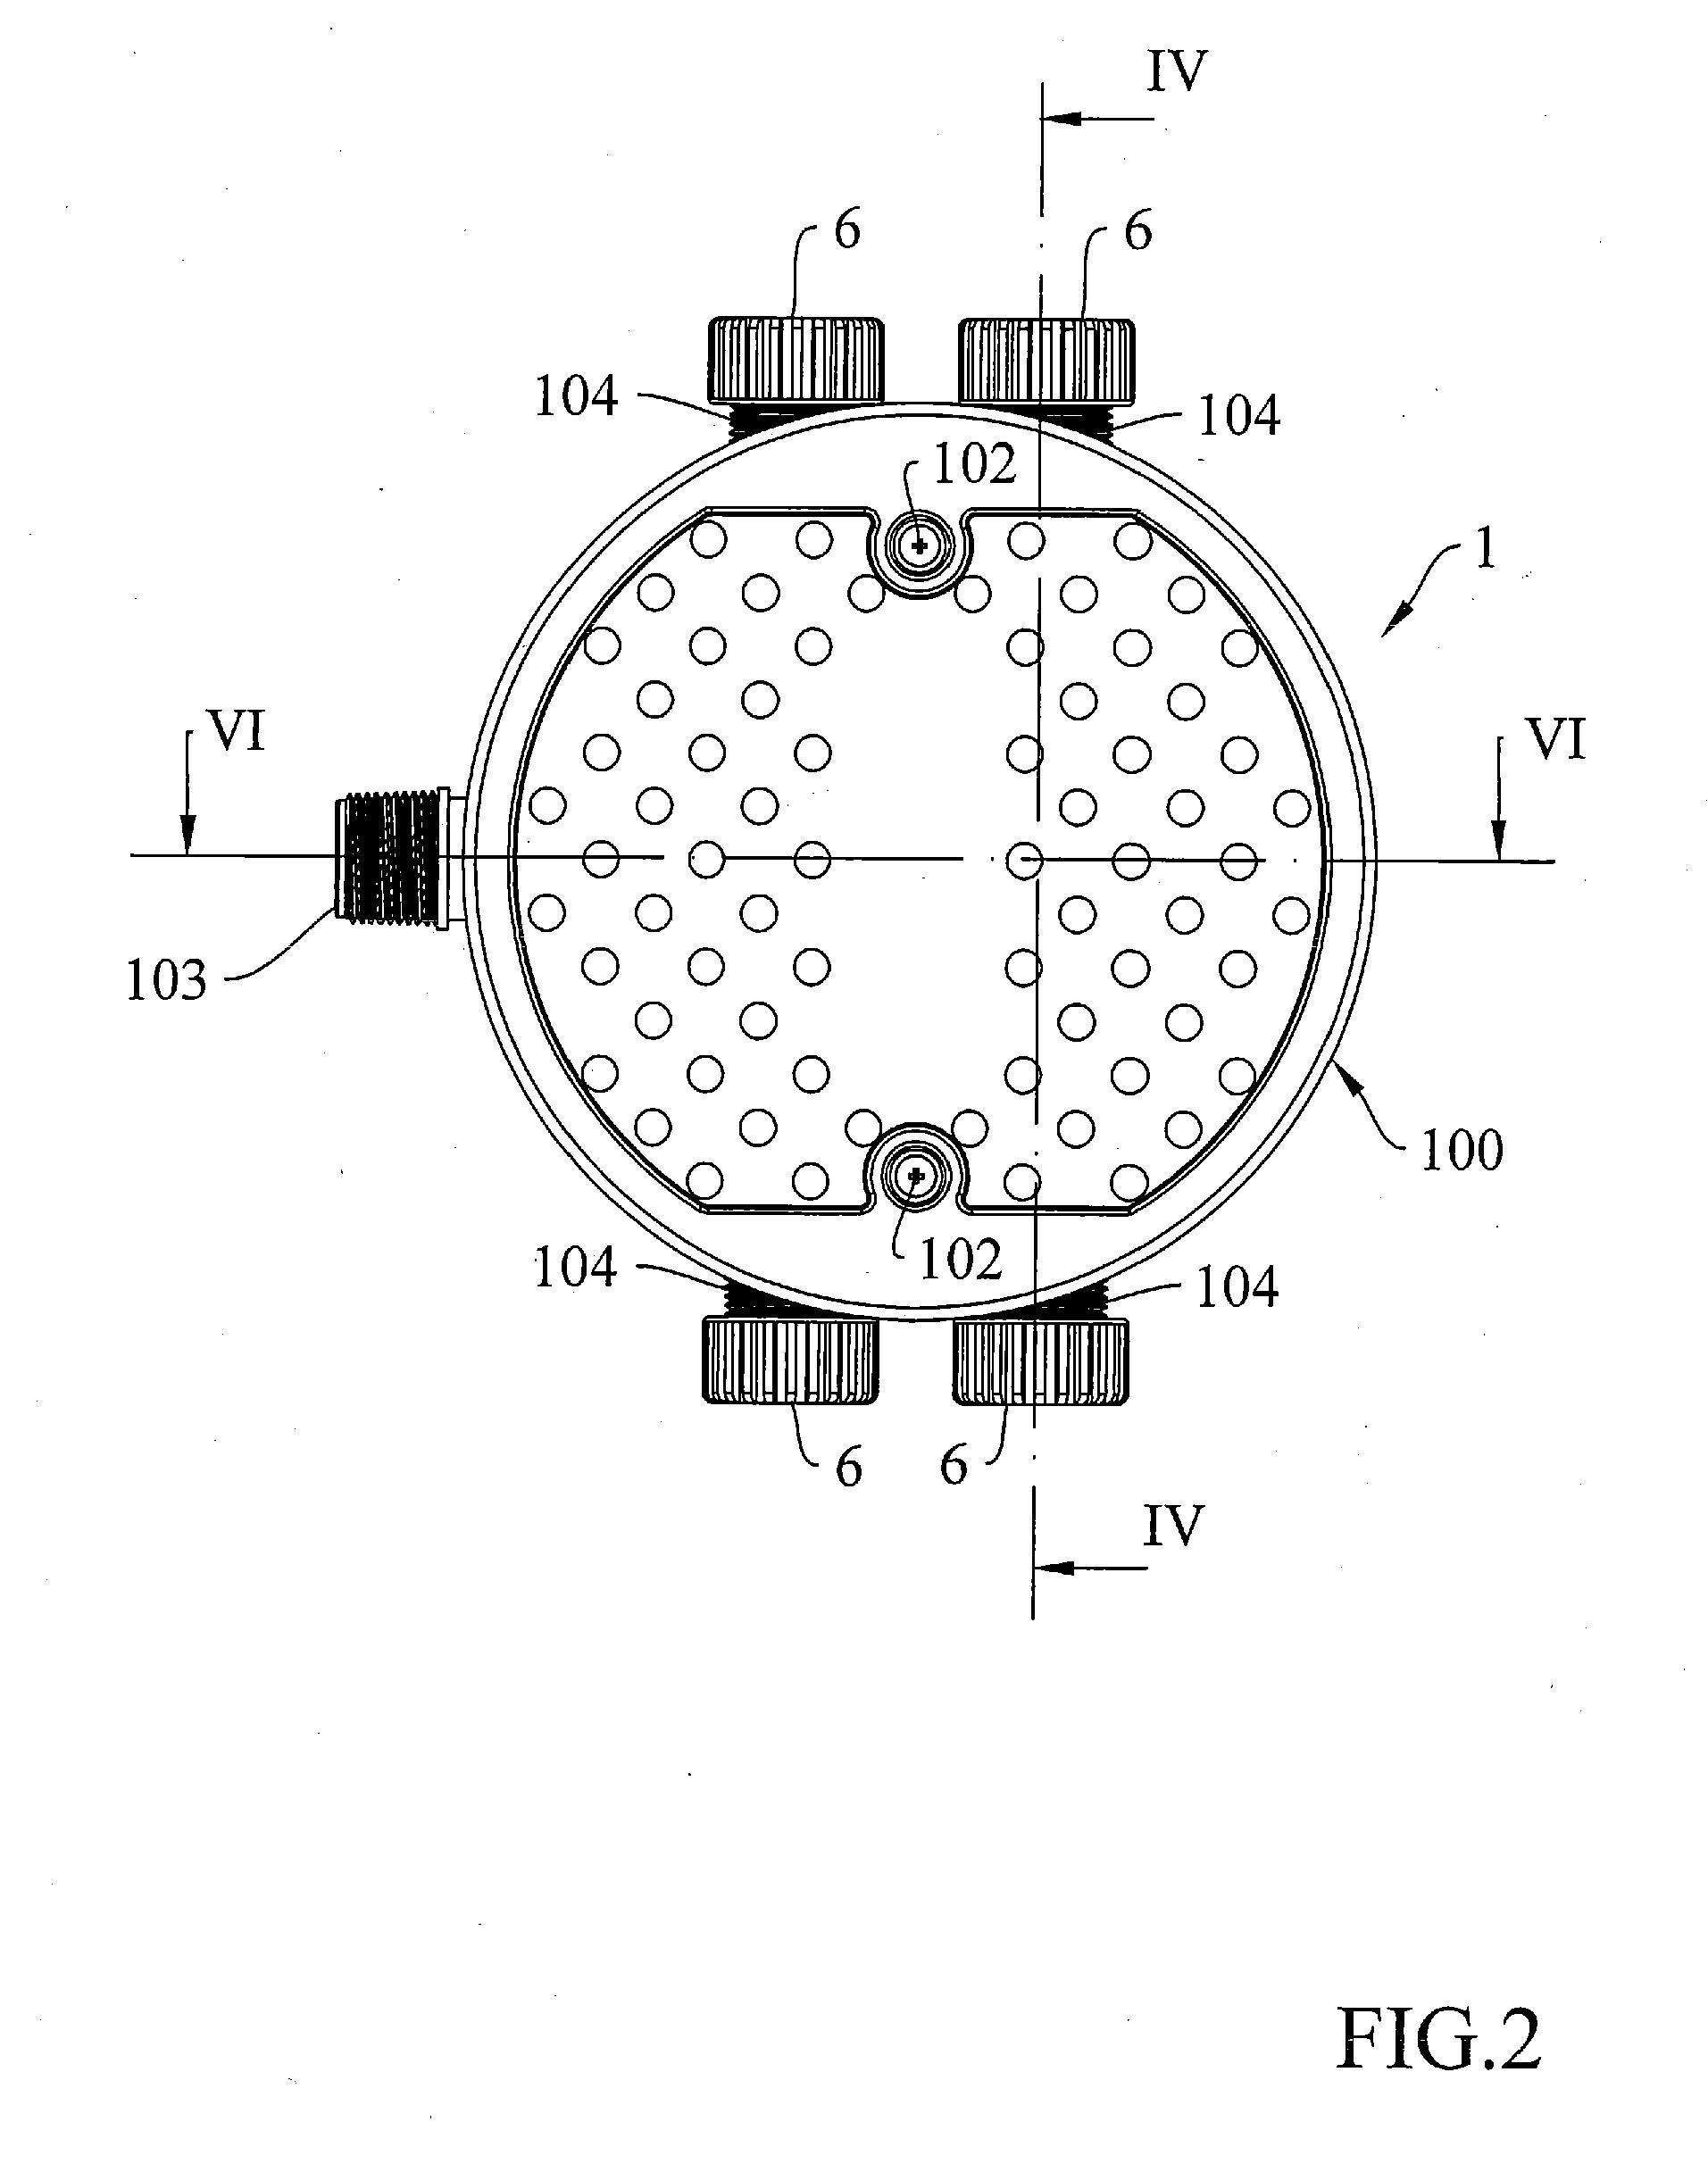 Wiring Diagram For Orbit Sprinkler System